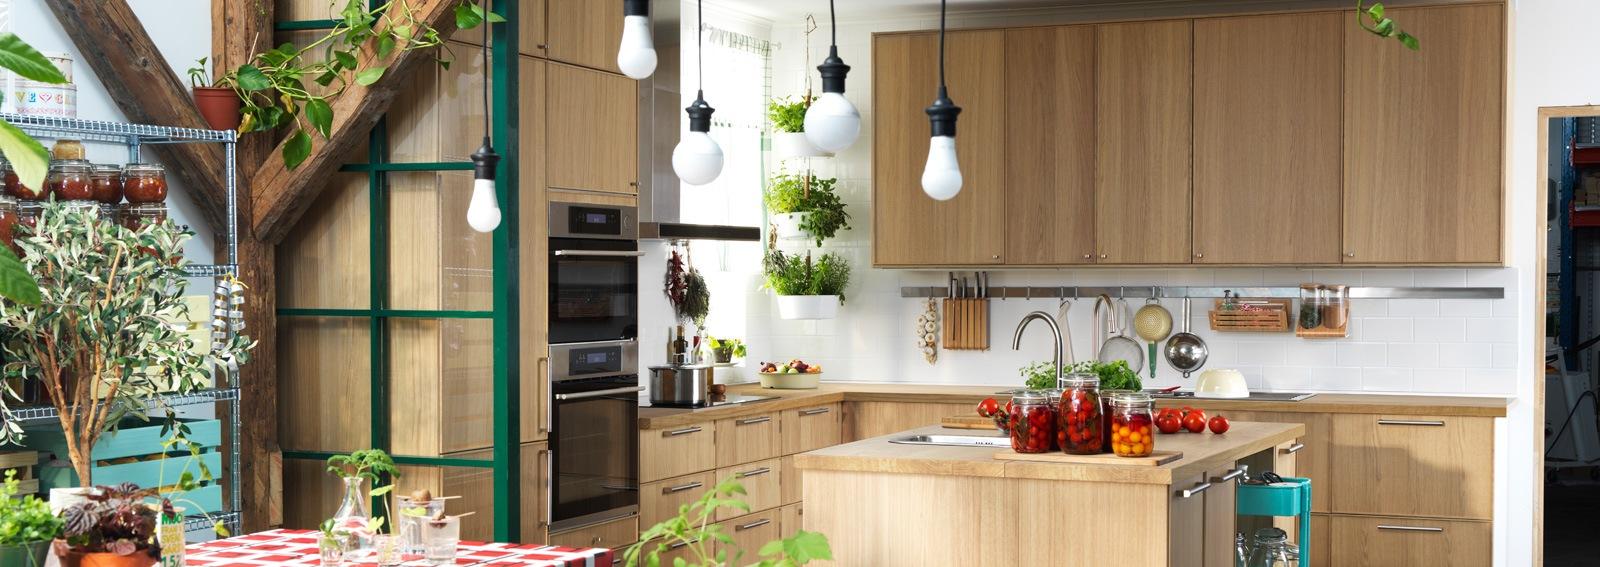 Beautiful Catalogo Ikea Accessori Cucina Images - Home Interior ...